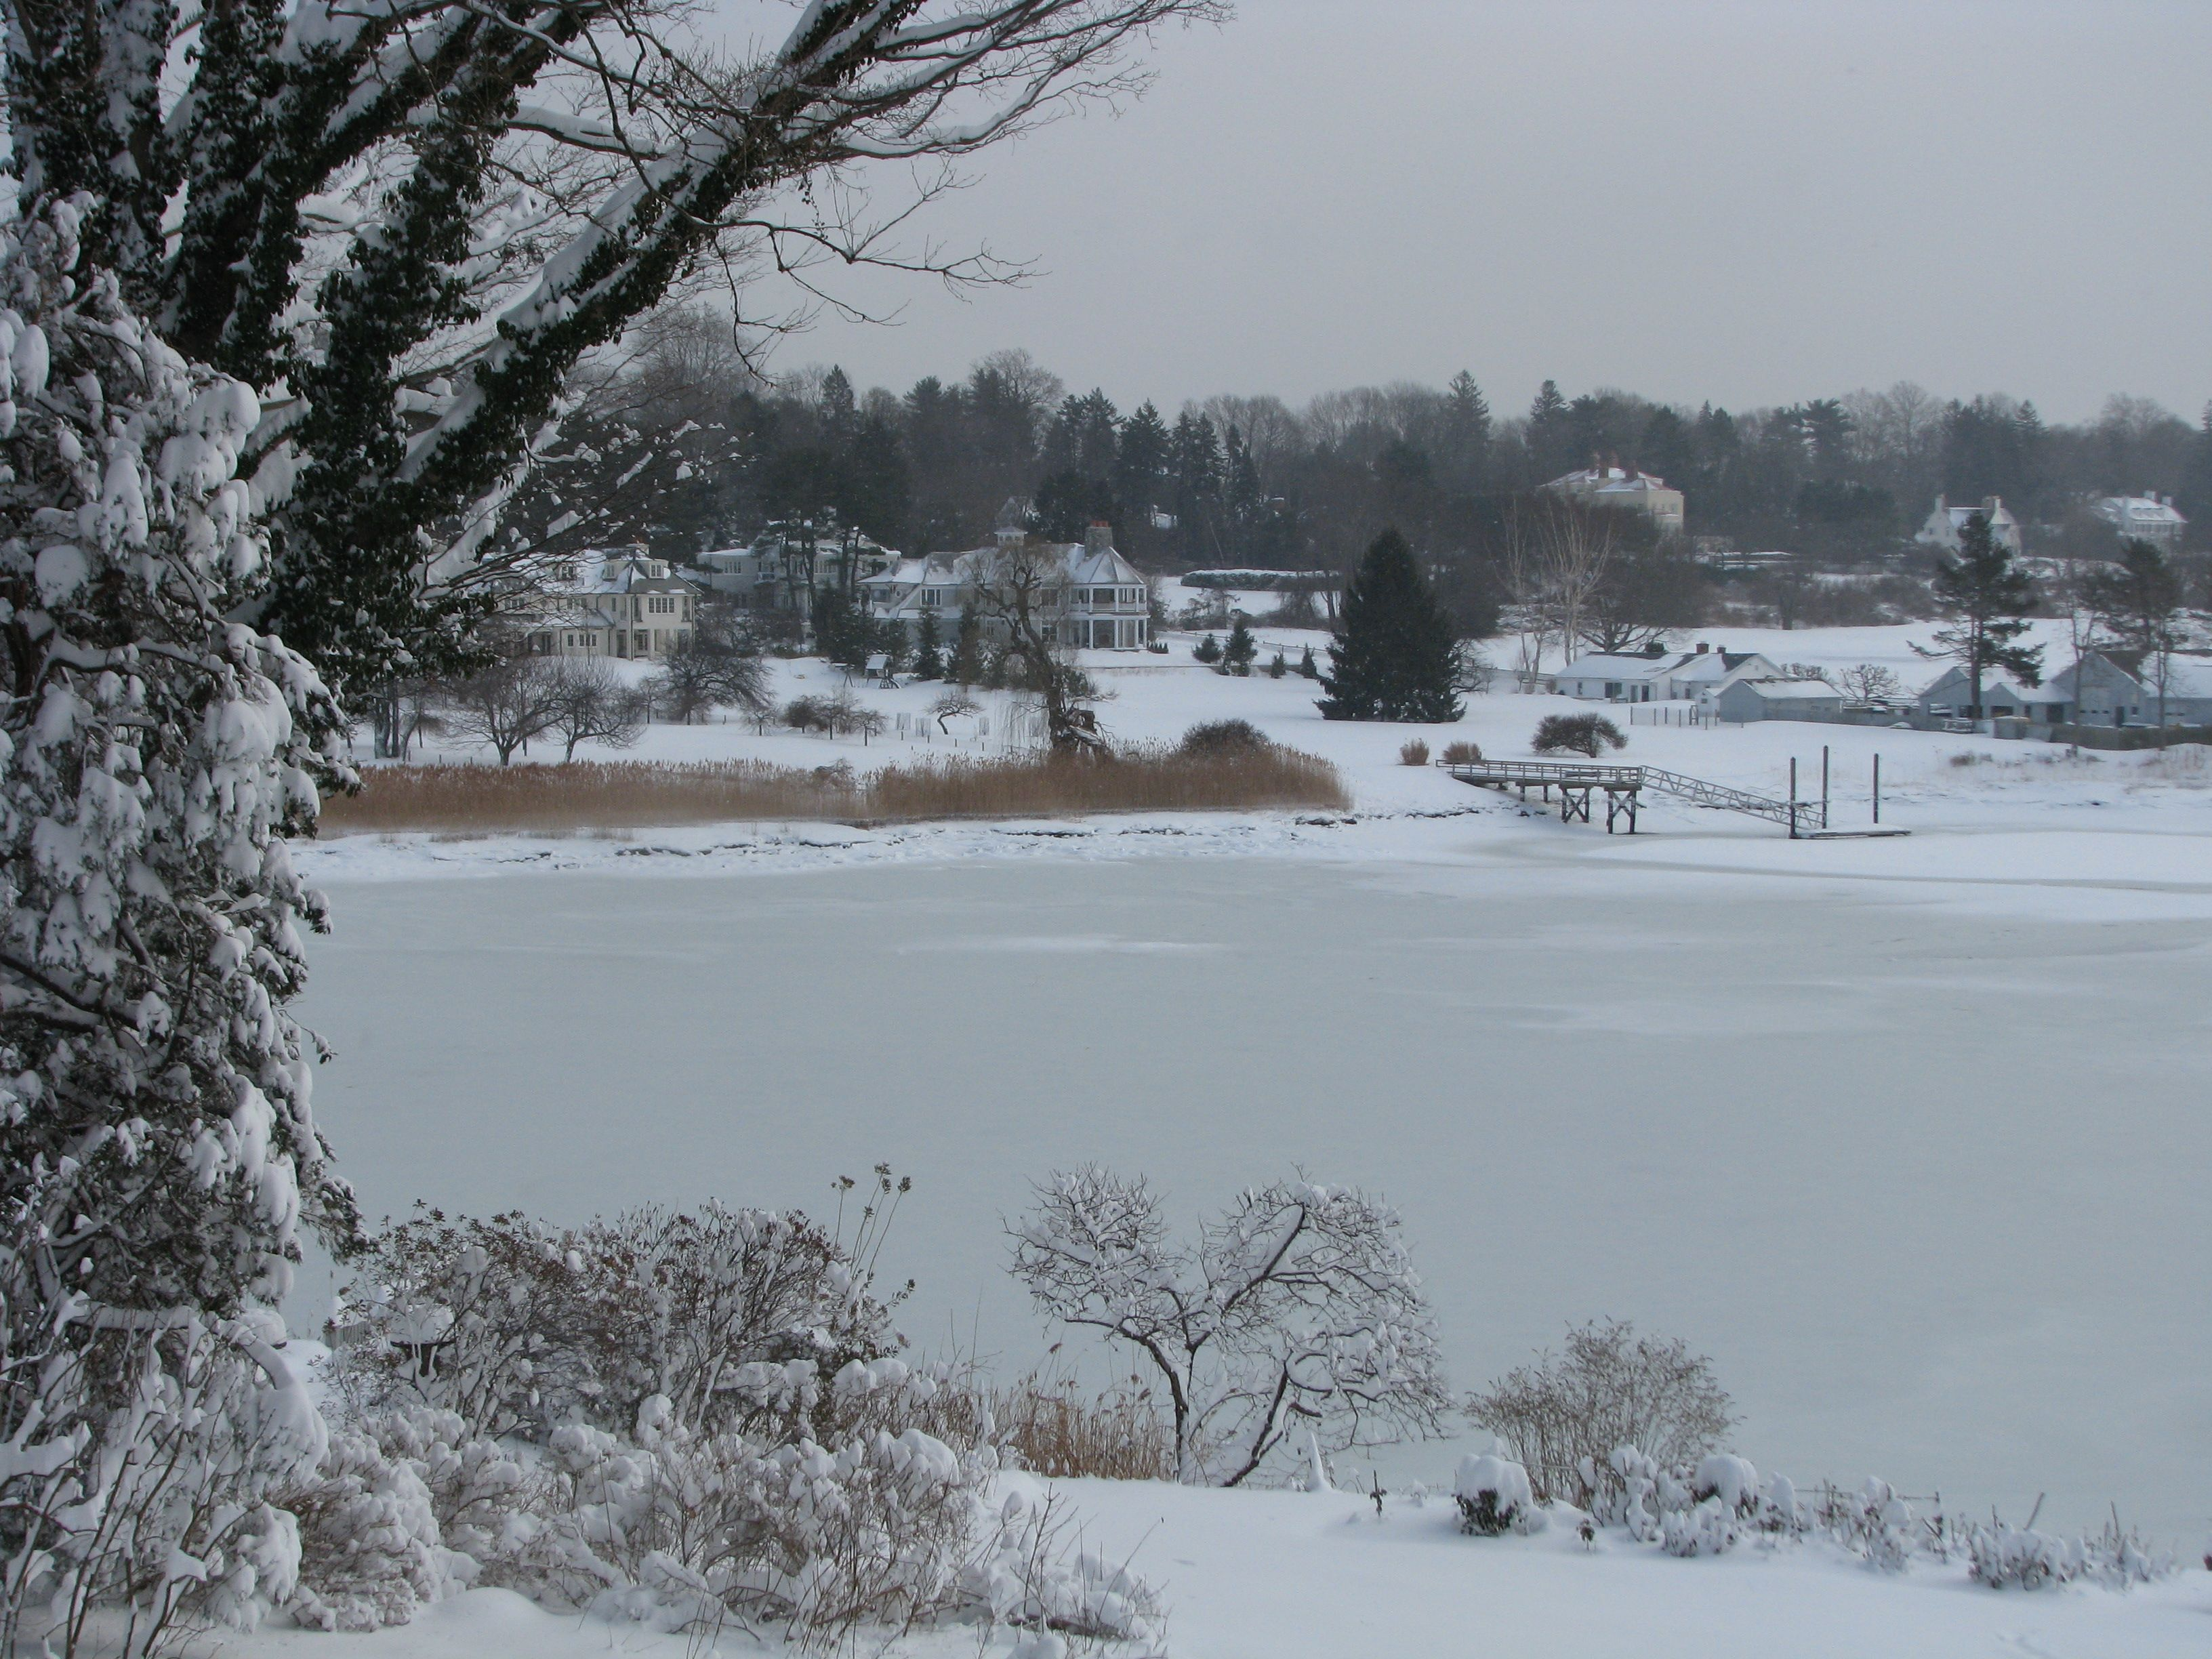 Harbor in the winter